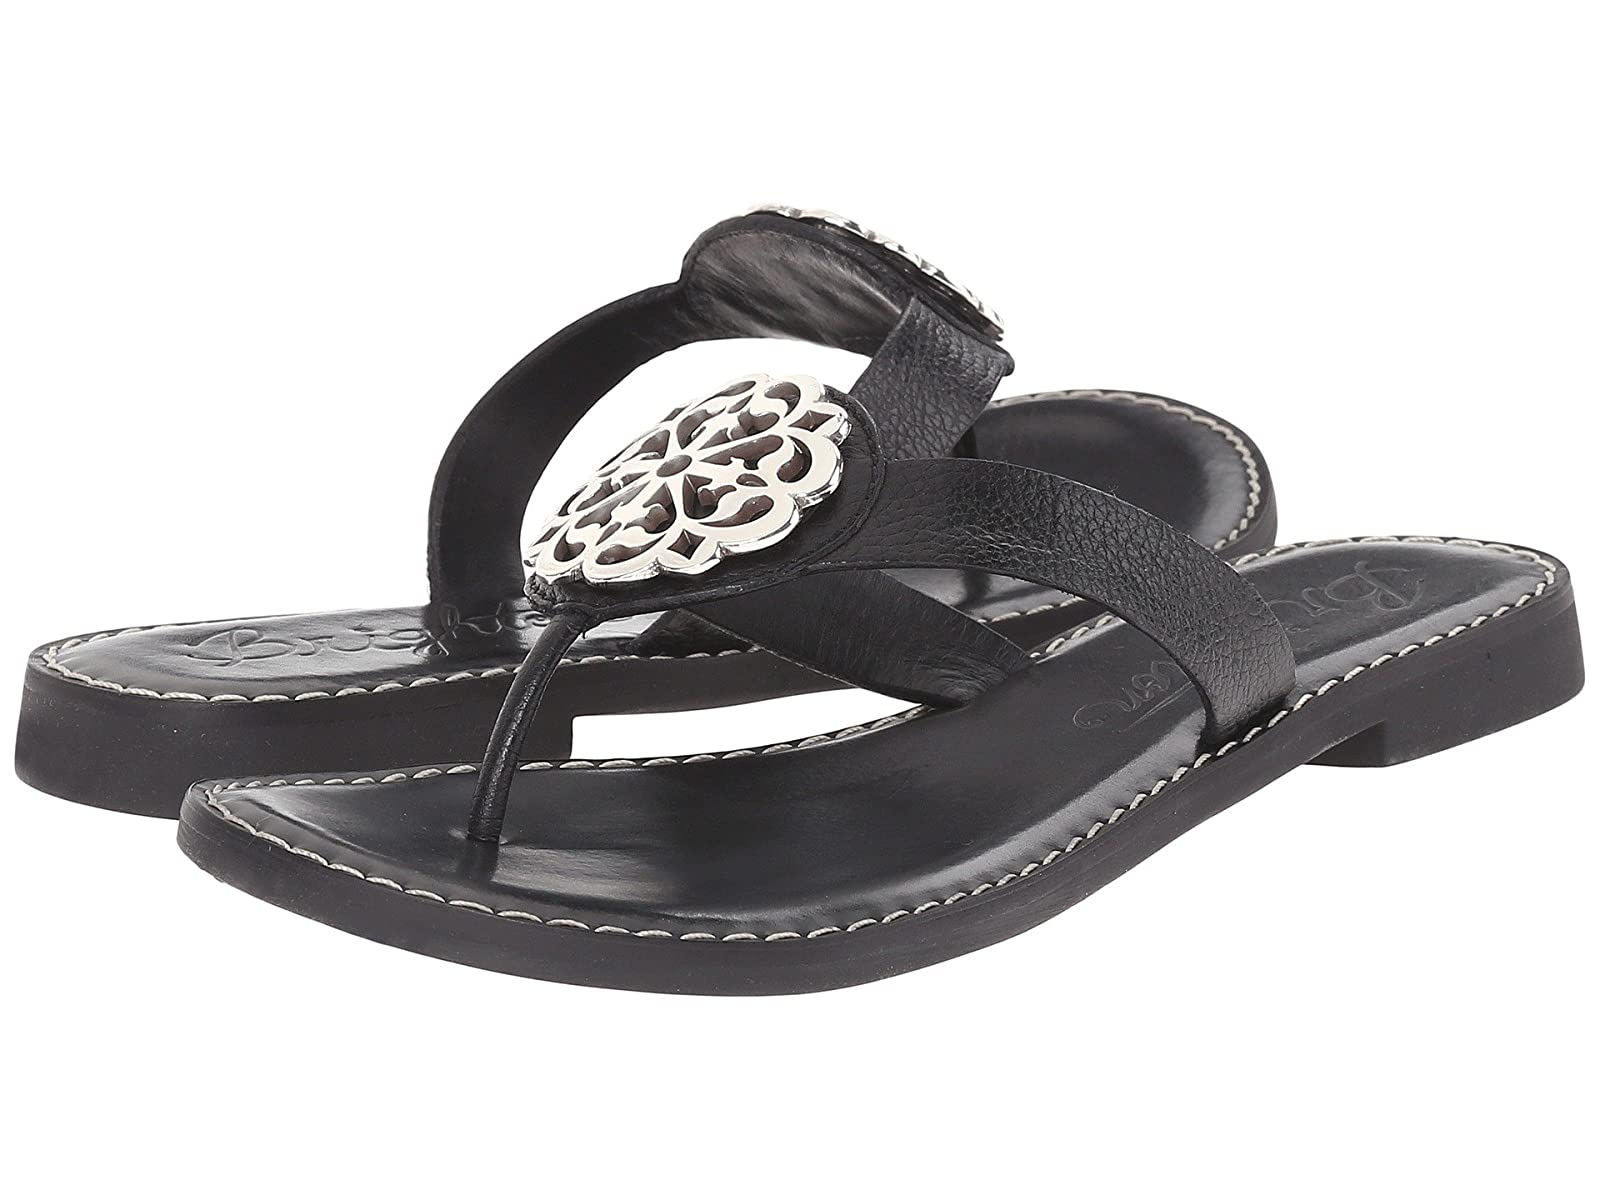 Brighton AliceComfortable and distinctive shoes